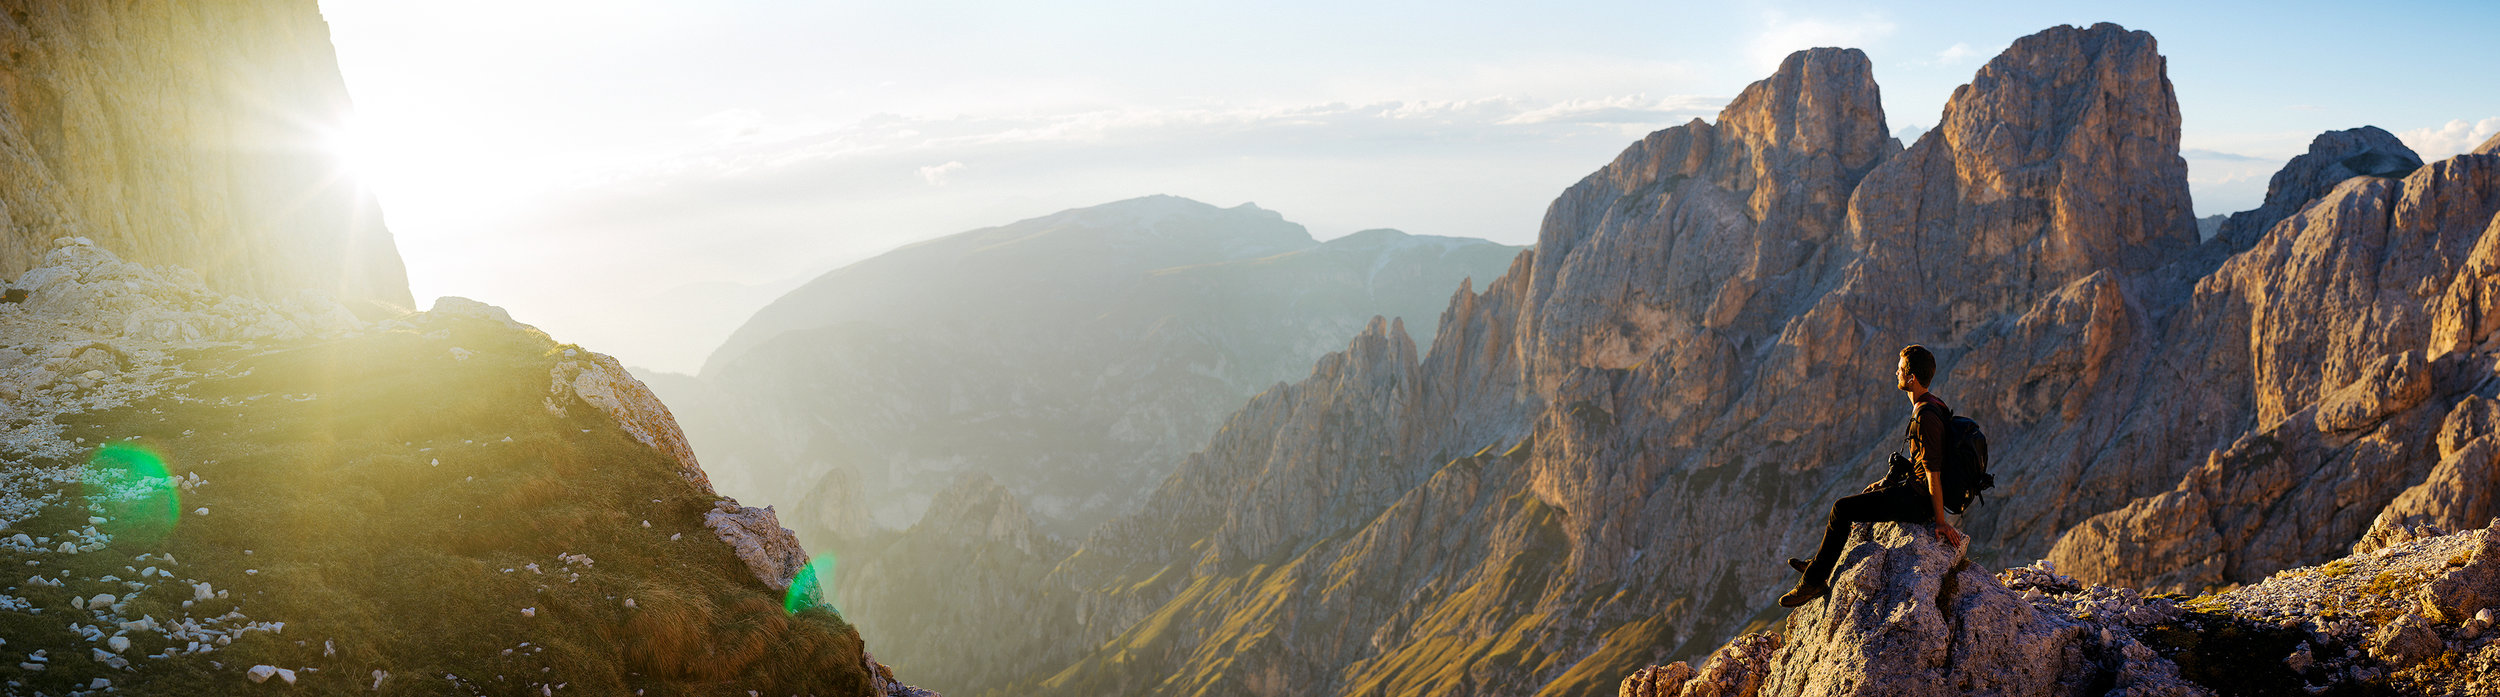 3 Hiking Dolomites Italy B0004849-Pano+copysmall.jpg